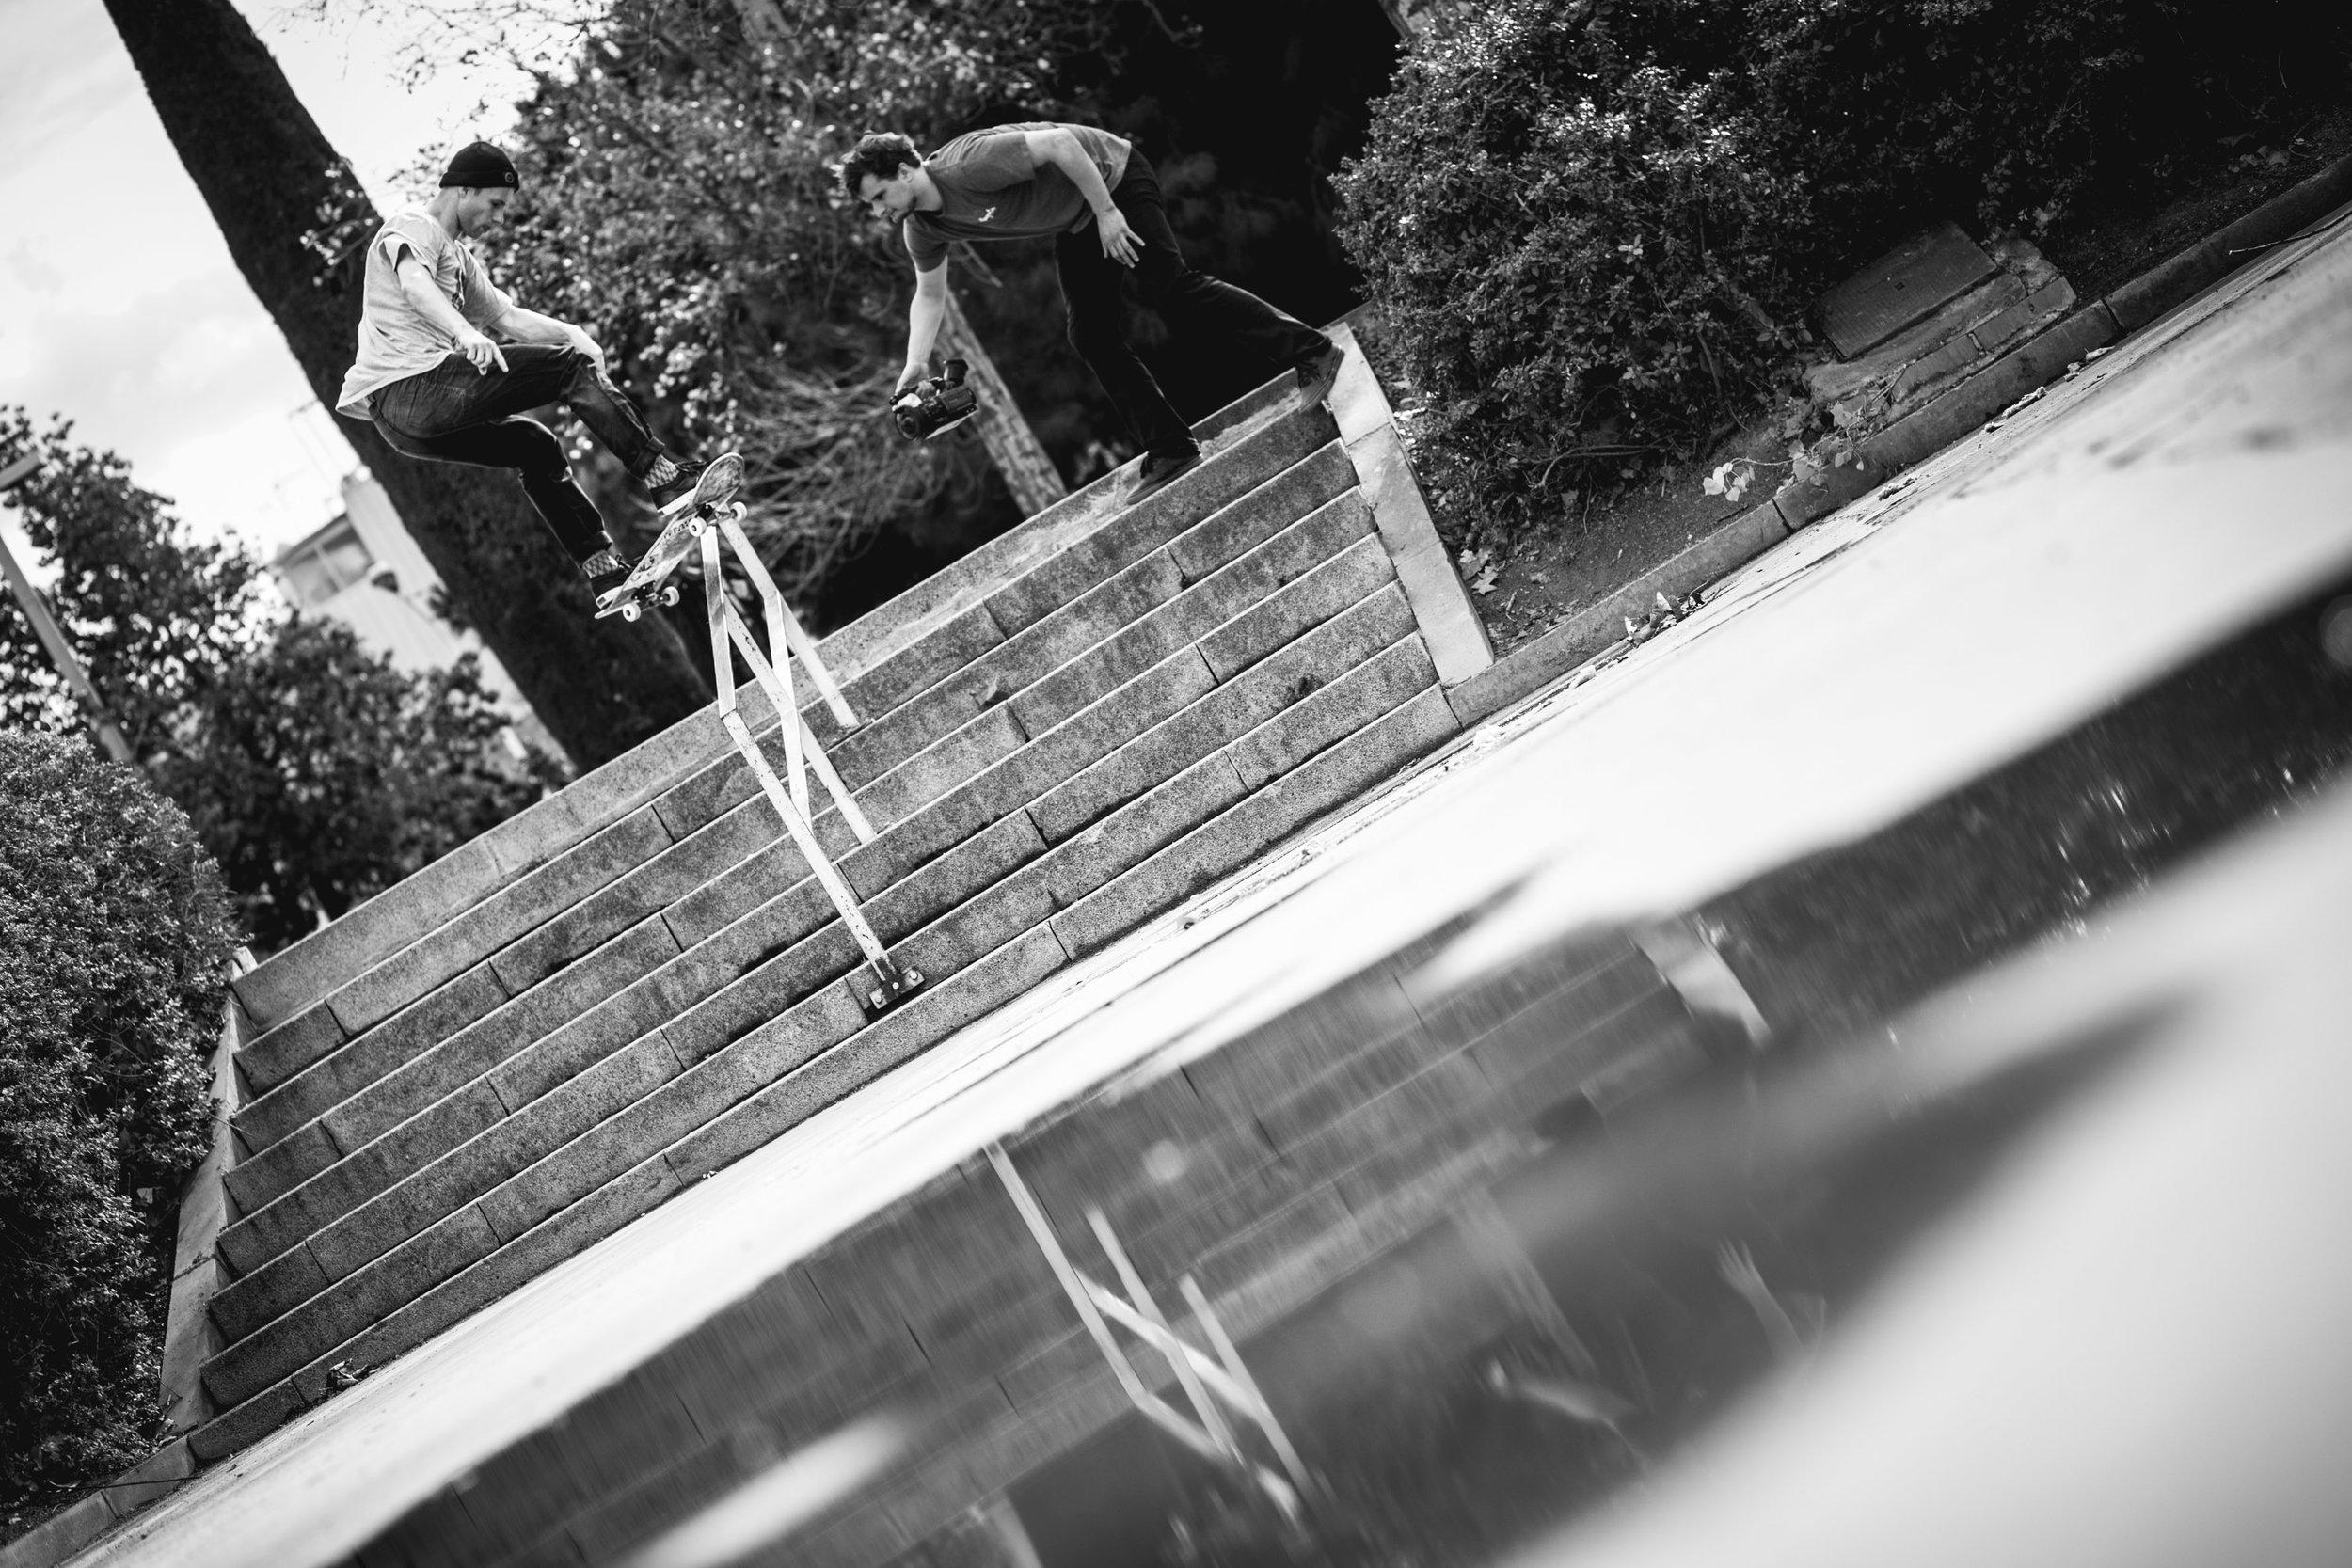 Jonathan Marty - Frontside boardslide